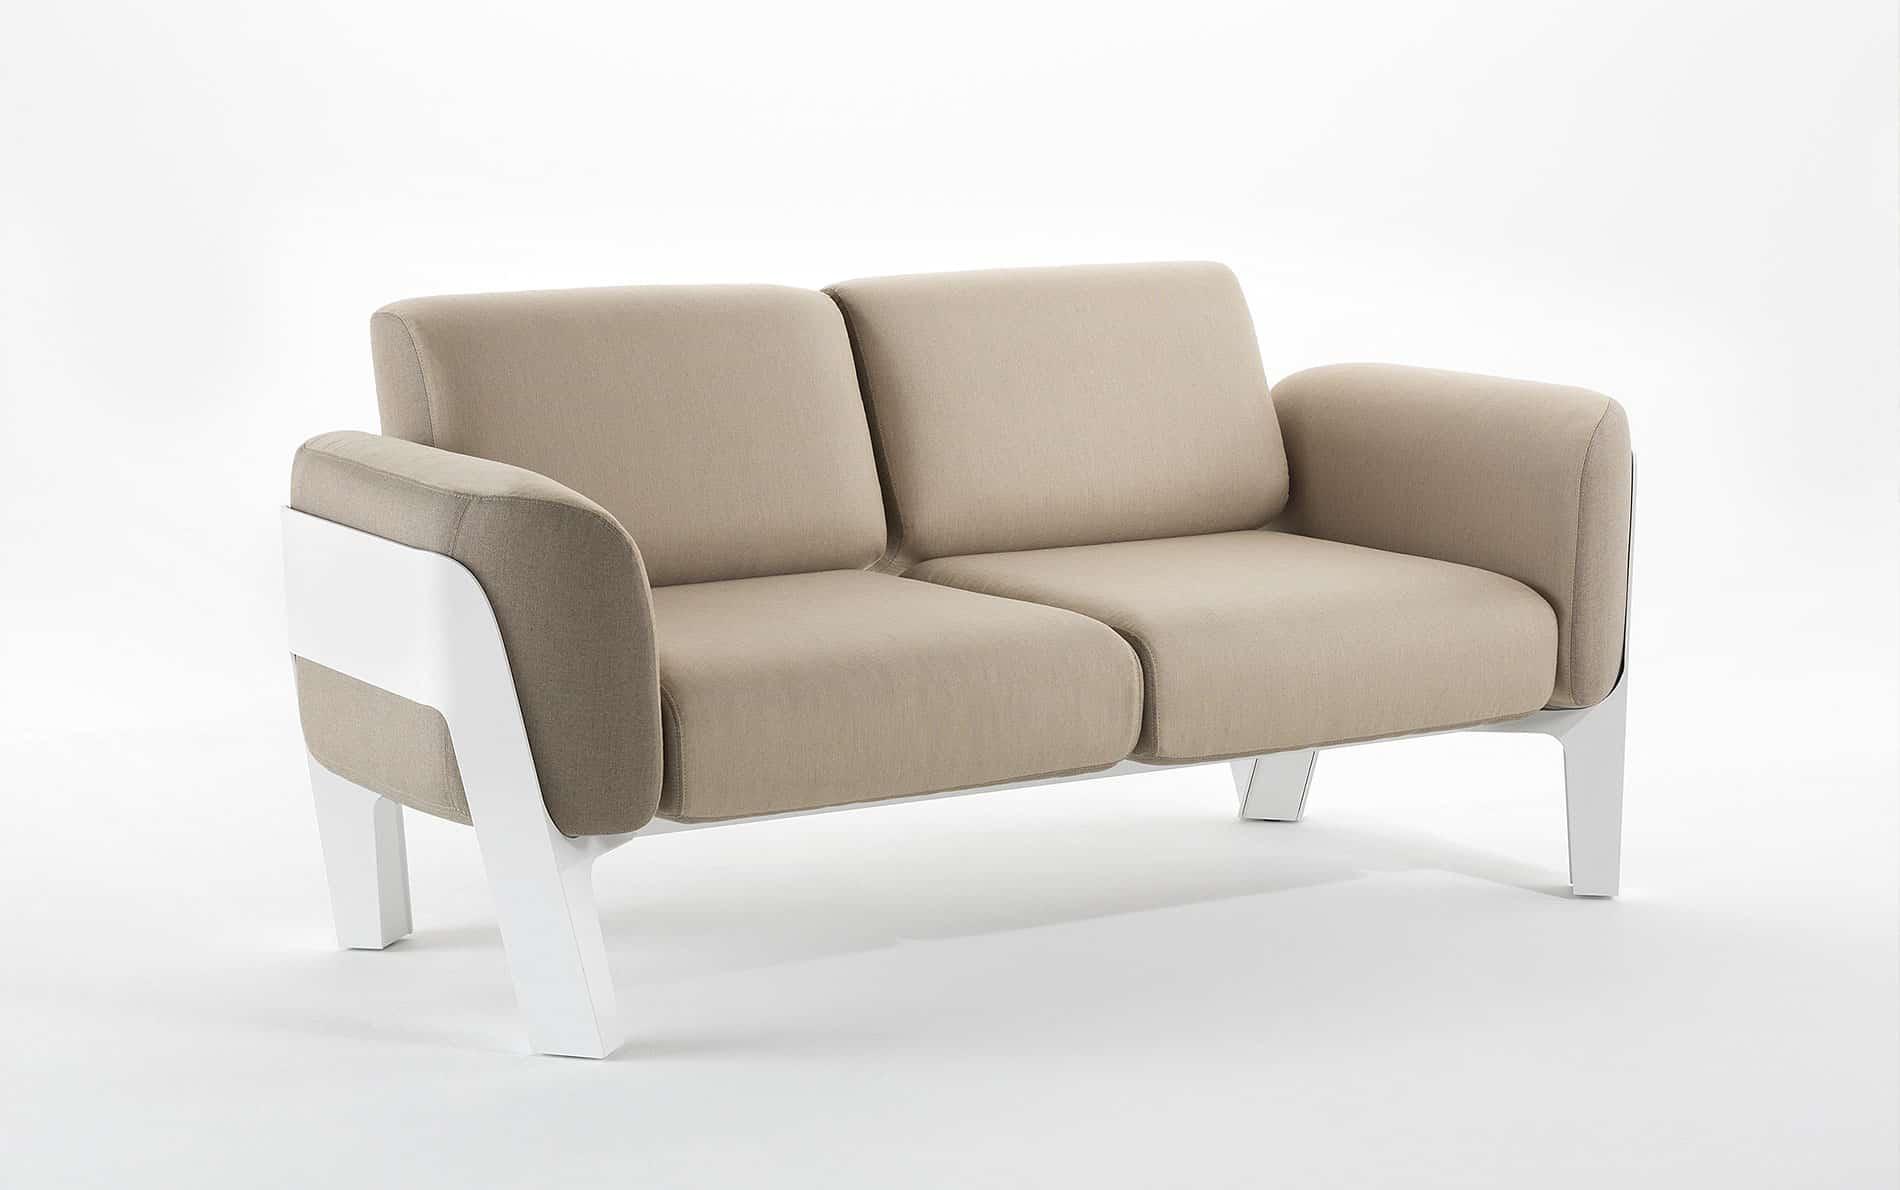 loungem bel garten online kaufen m bel suchmaschine. Black Bedroom Furniture Sets. Home Design Ideas